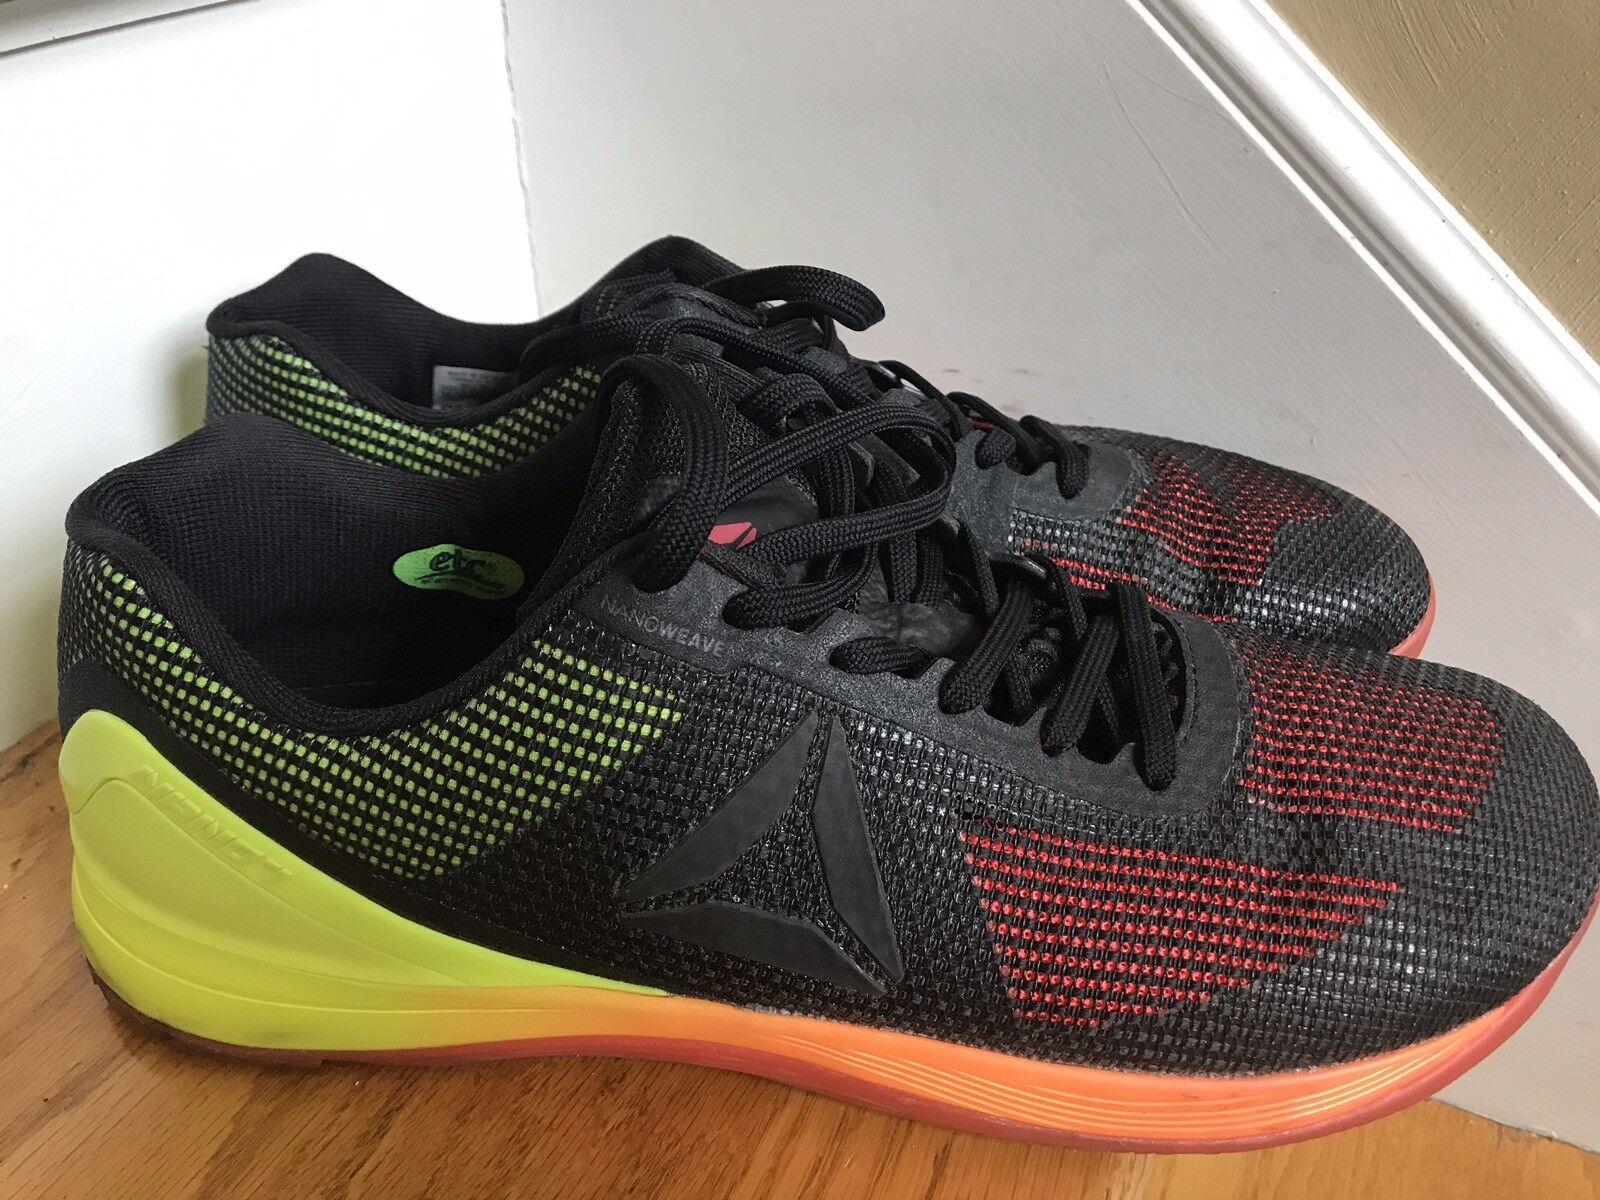 Reebok  Cross Fit Nano 7 shoes Size 14M ECU Boho Retro Workout Fitness ECU